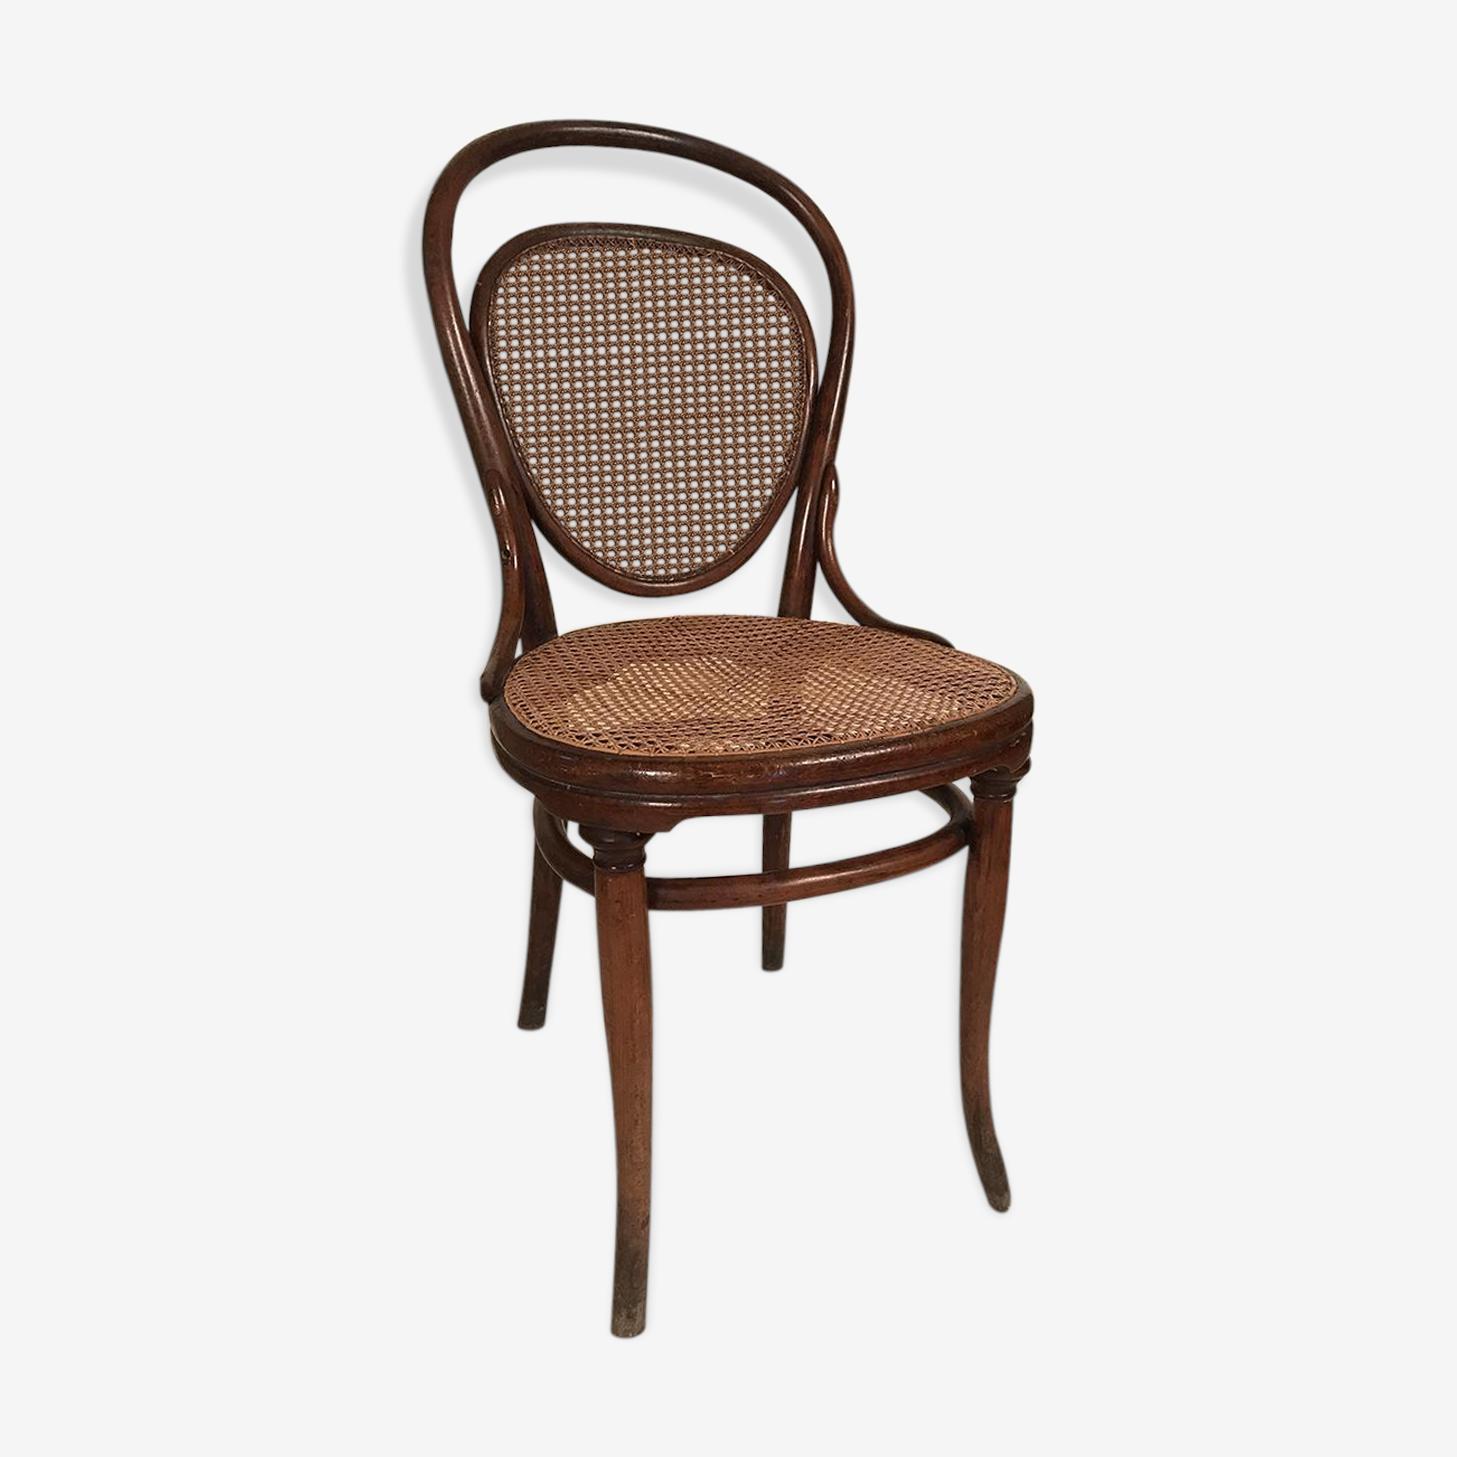 Chaise Thonet, chaise bistrot bois courbé fin XIXe